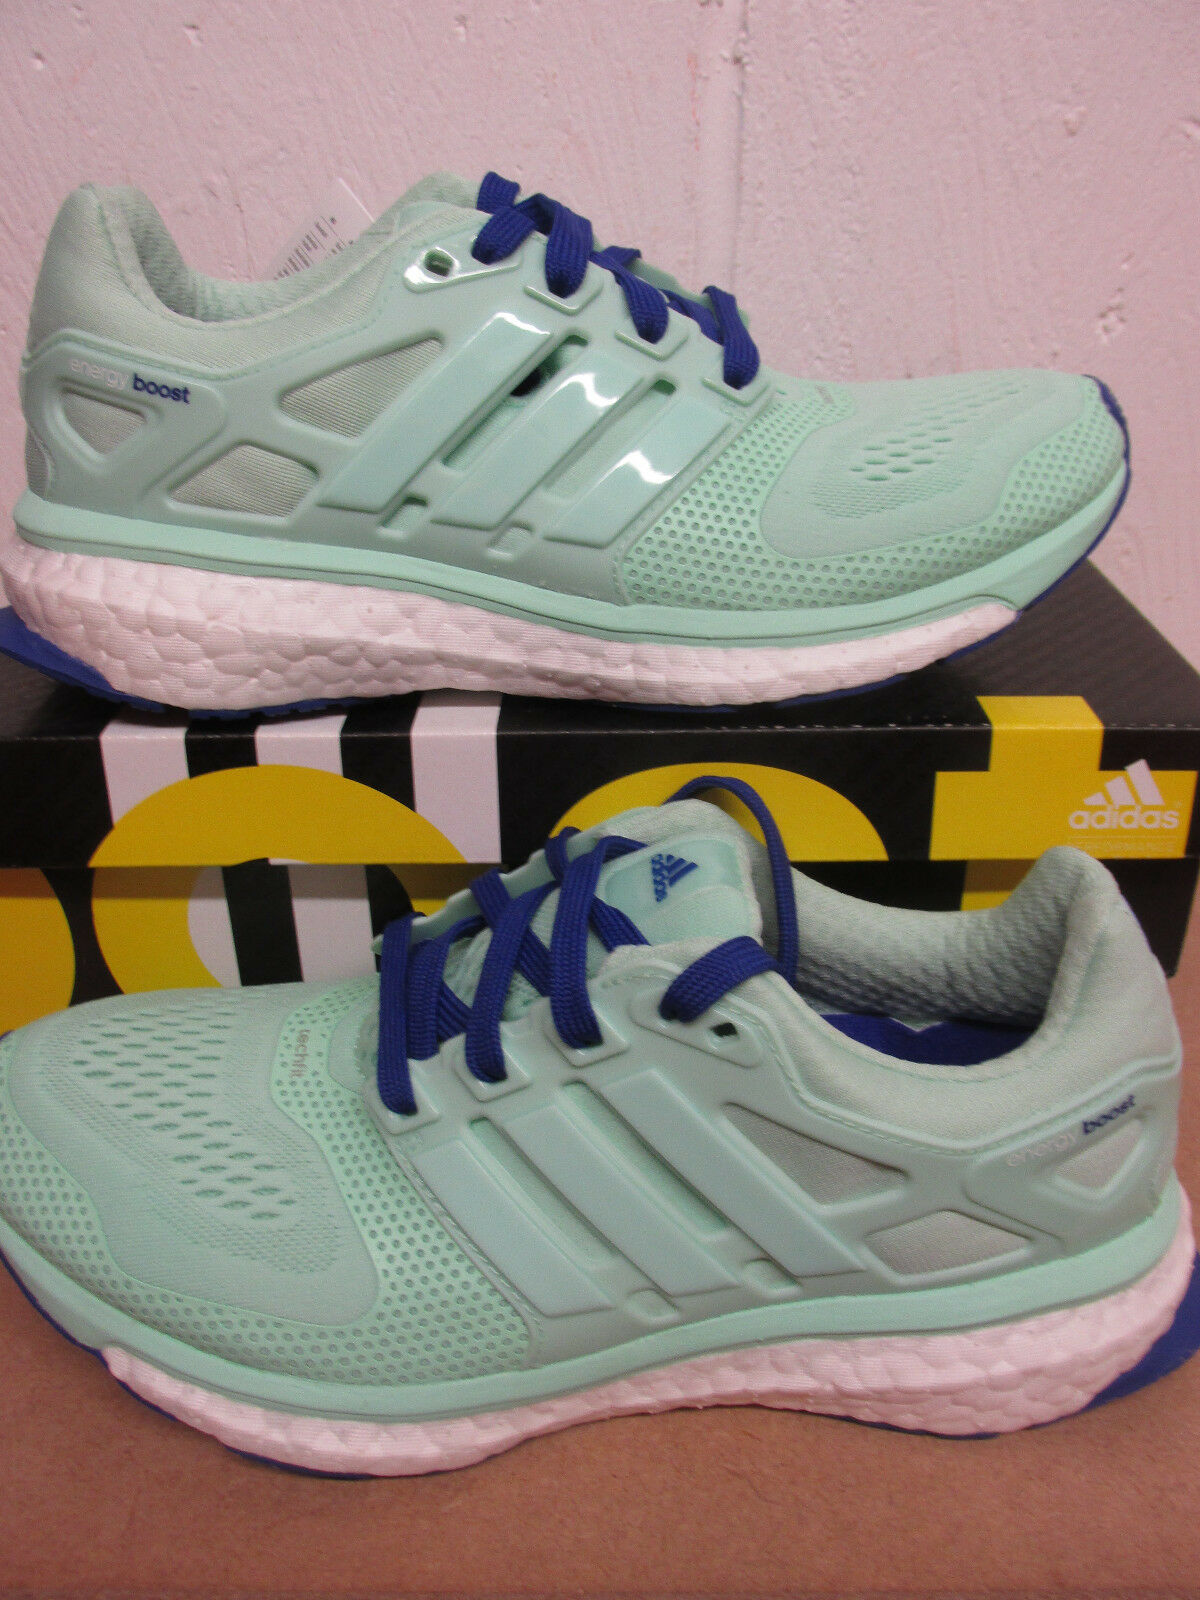 Adidas Energy Boost Esm Damen S83147 Laufschuhe